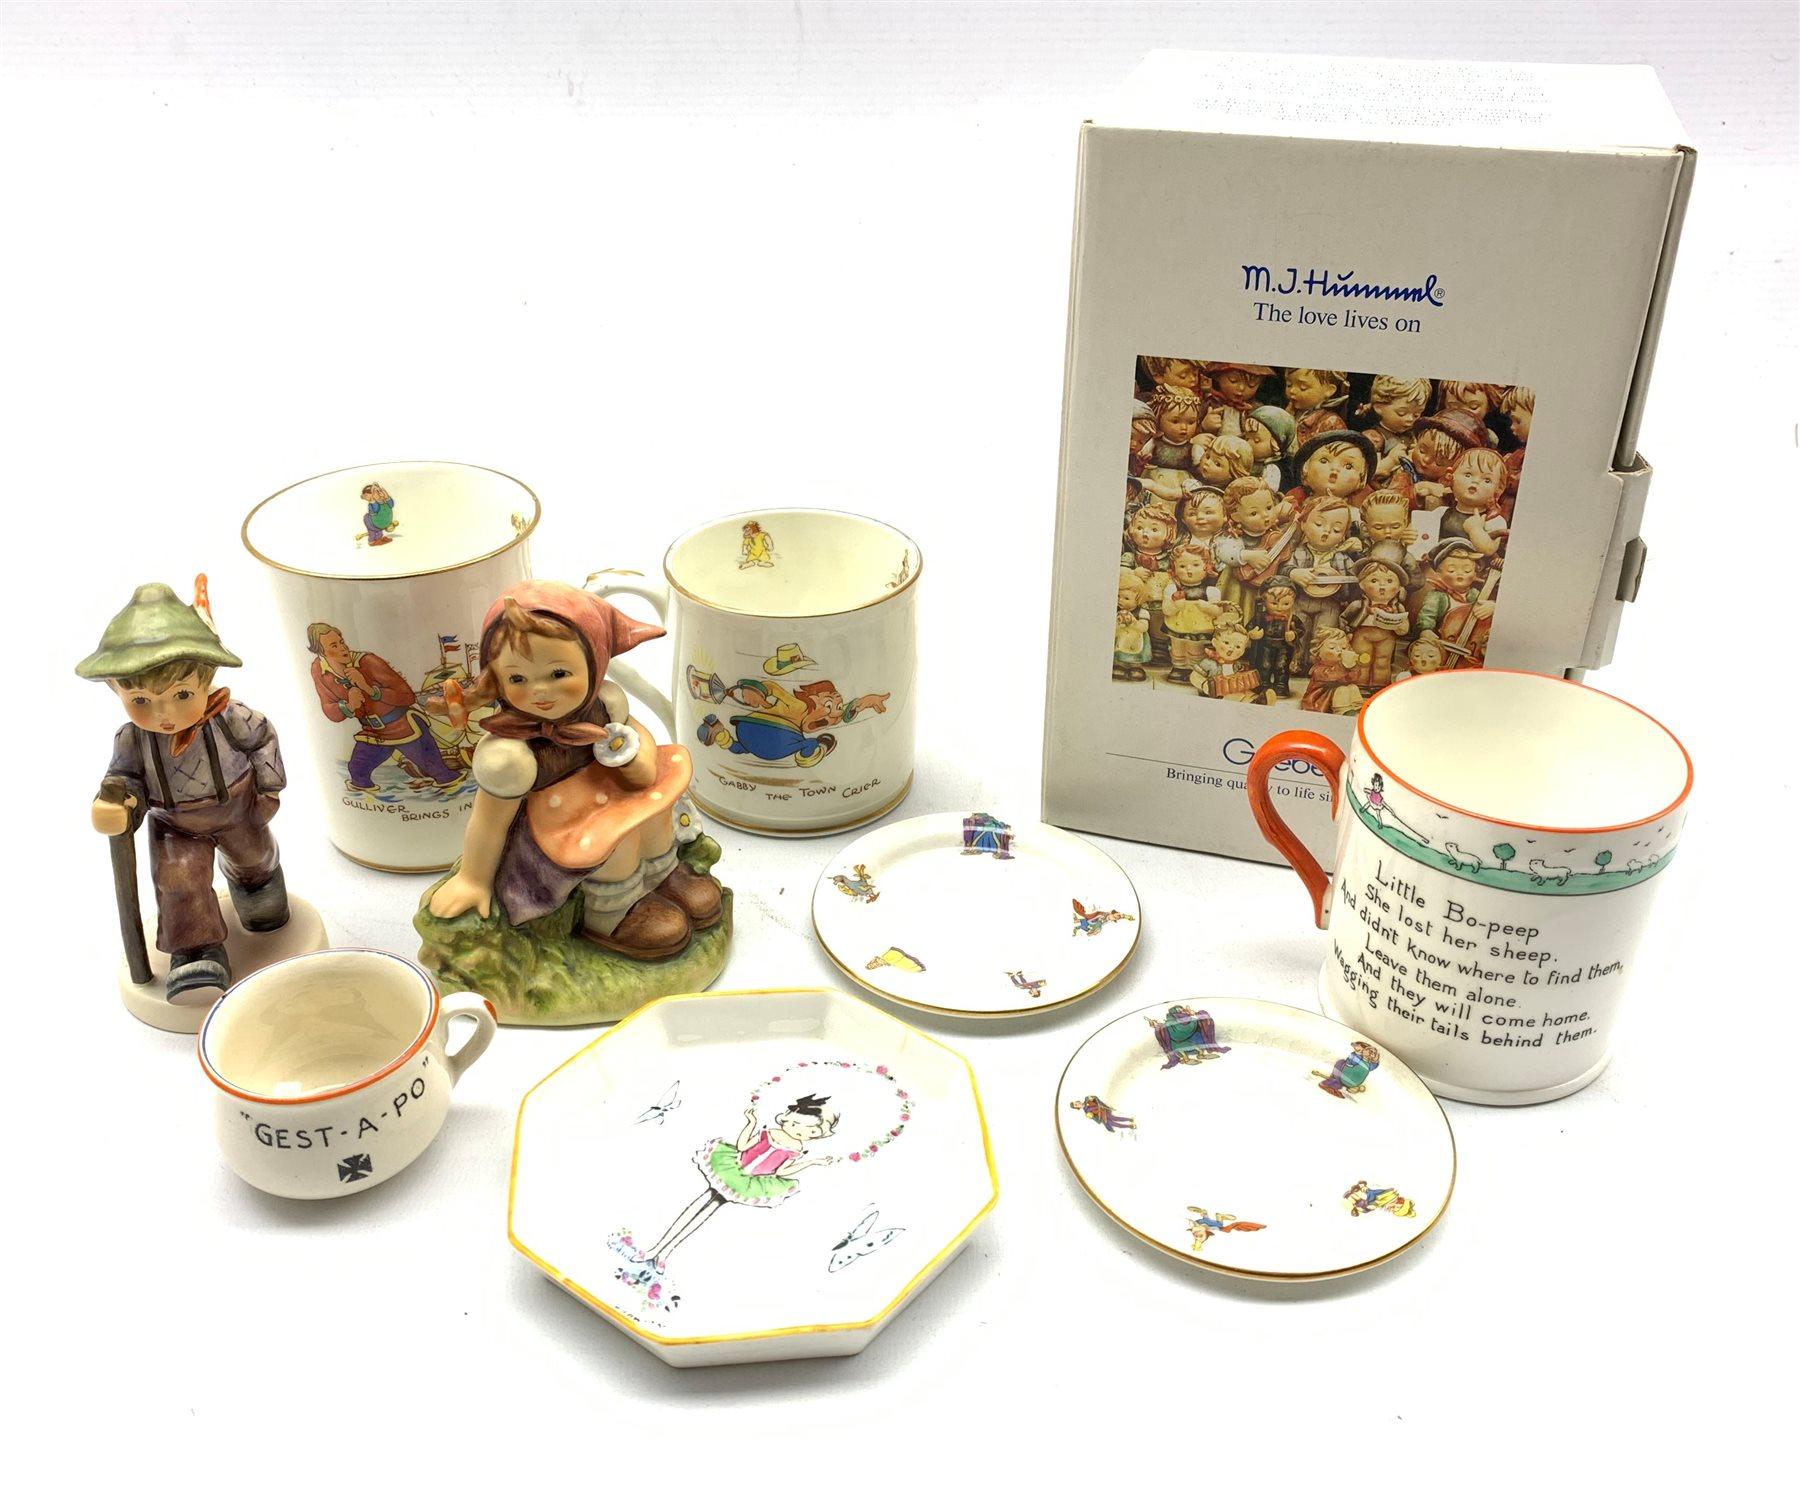 Hammersley & Co. Gulliver's Travels beaker & mug, a pair of Hammersley circular dishes, Shelley 'Lit